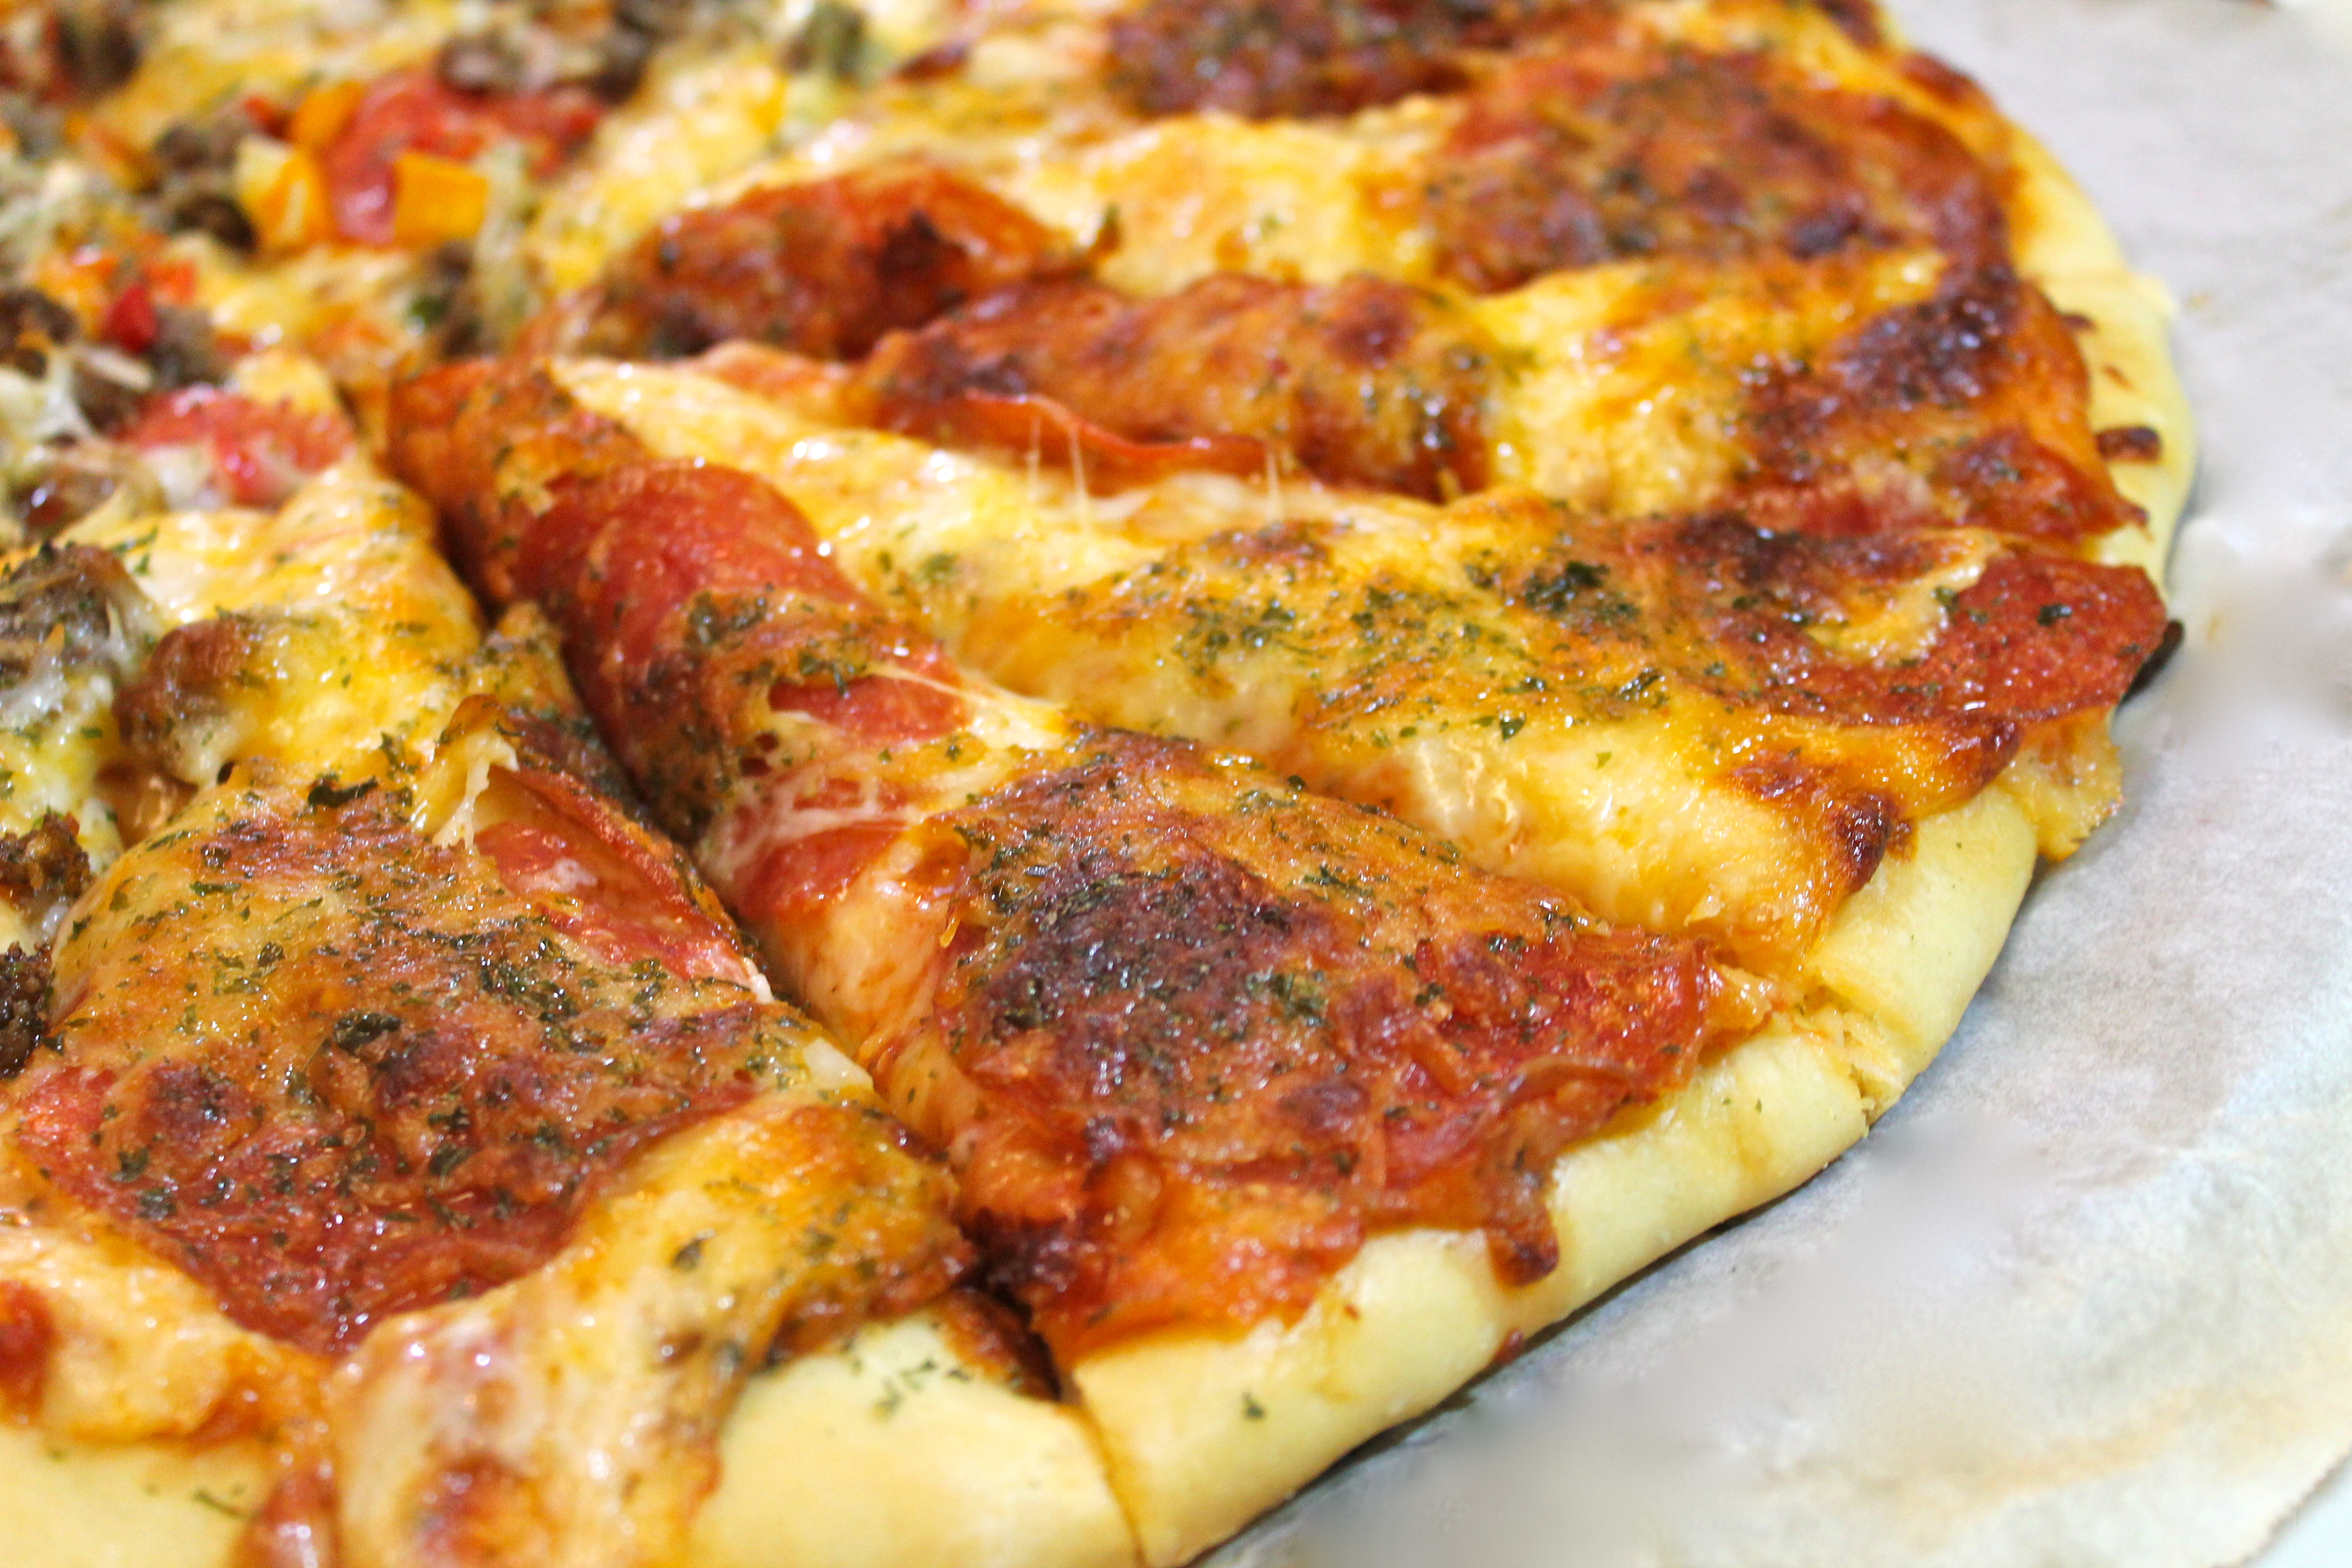 Homemade Pizza : No more Takeout! | I Heart Recipes